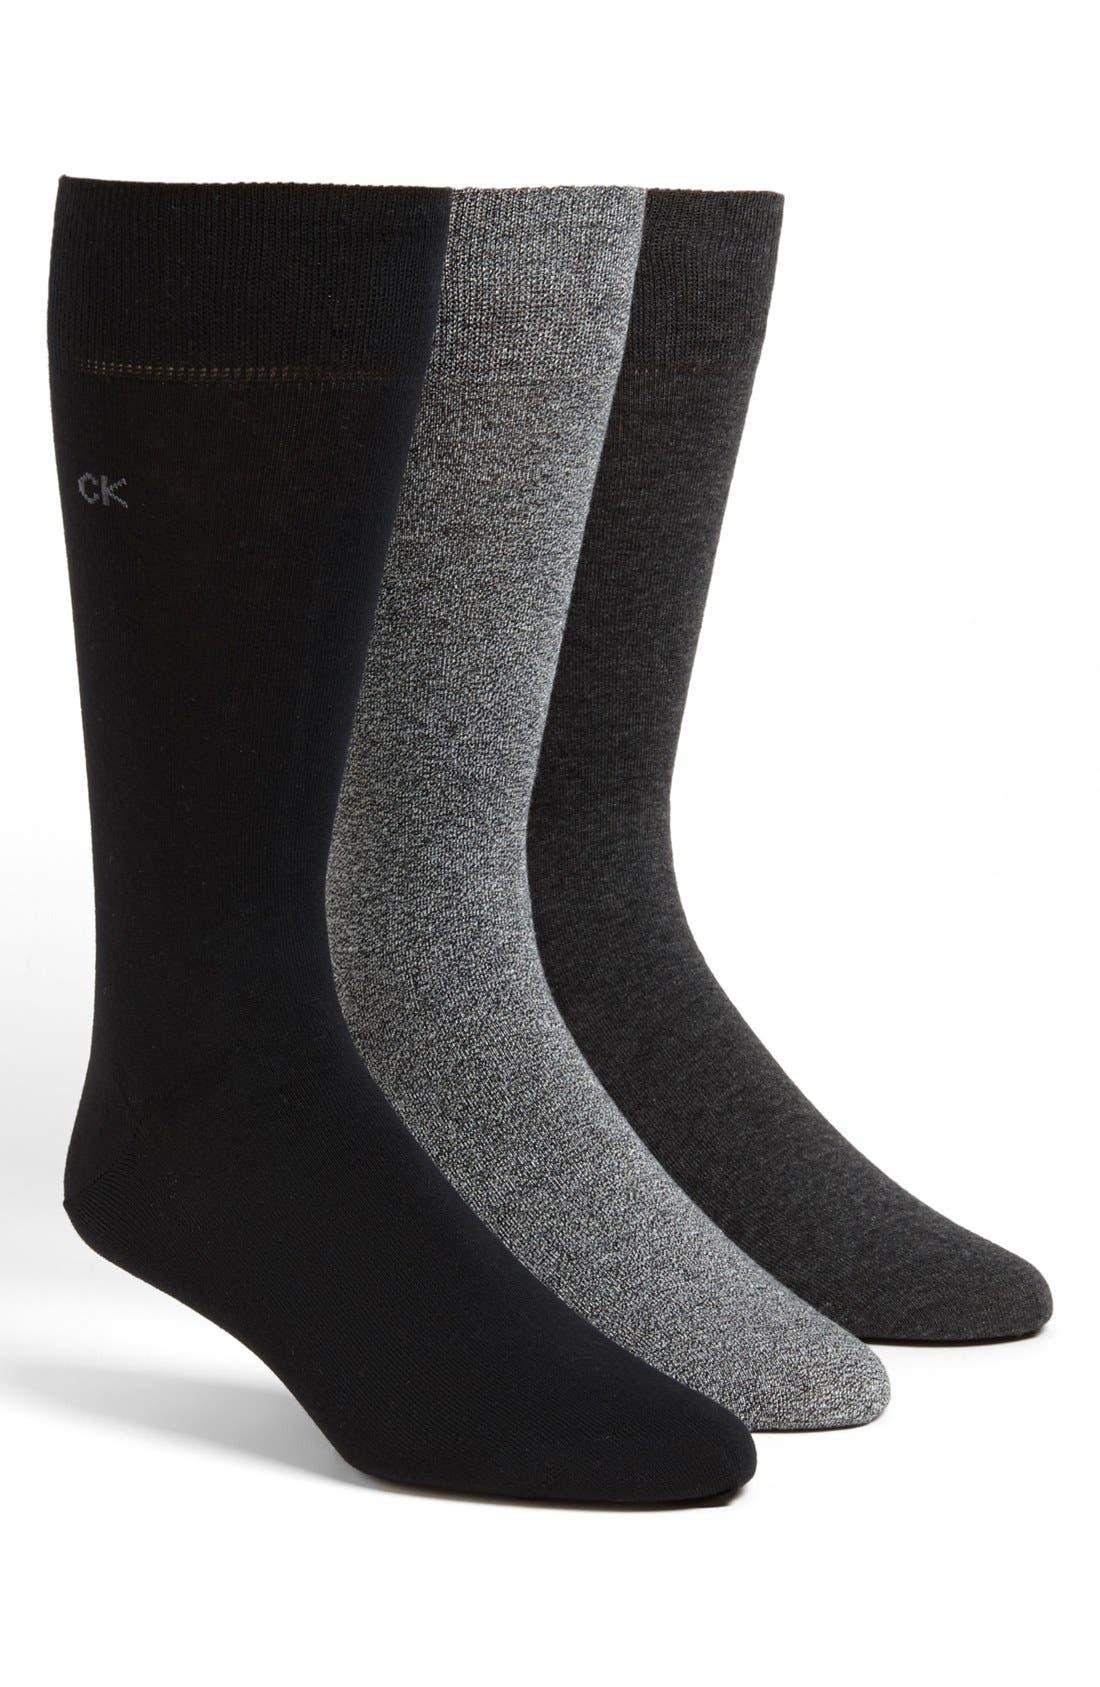 Main Image - Calvin Klein Assorted 3-Pack Socks